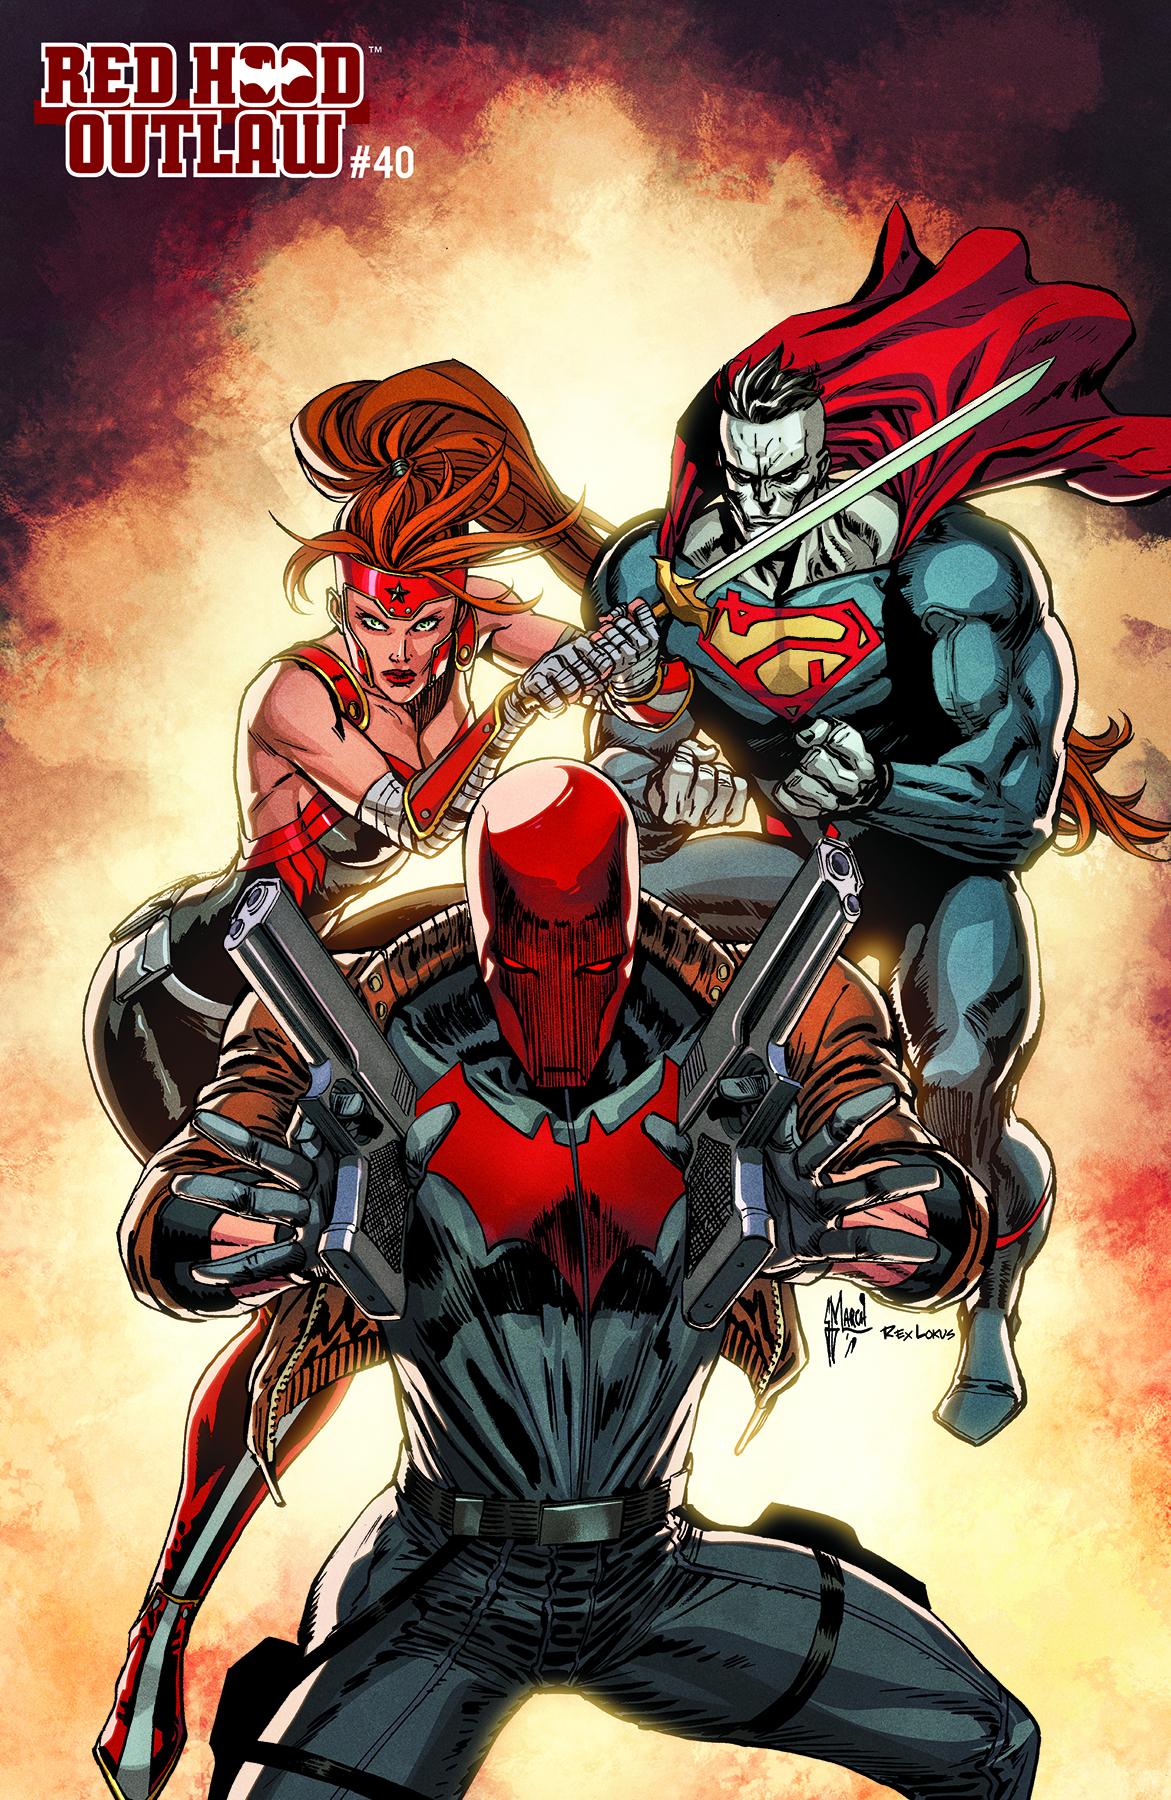 Red Hood Outlaw 40 Yotv Stl134429 Comics Dc Comics Dc